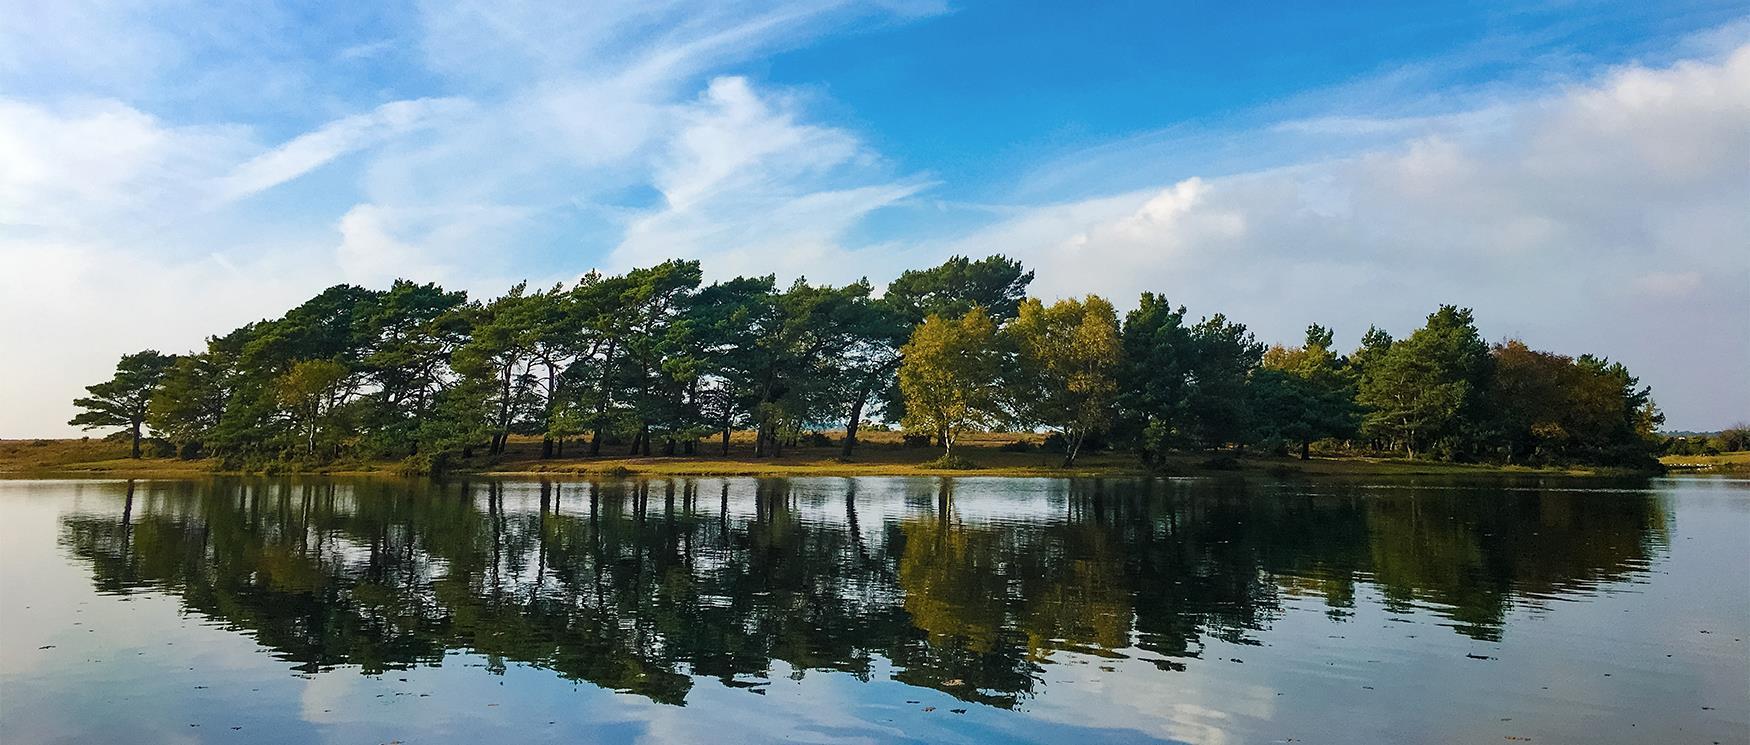 Hatchet Pond, New Forest